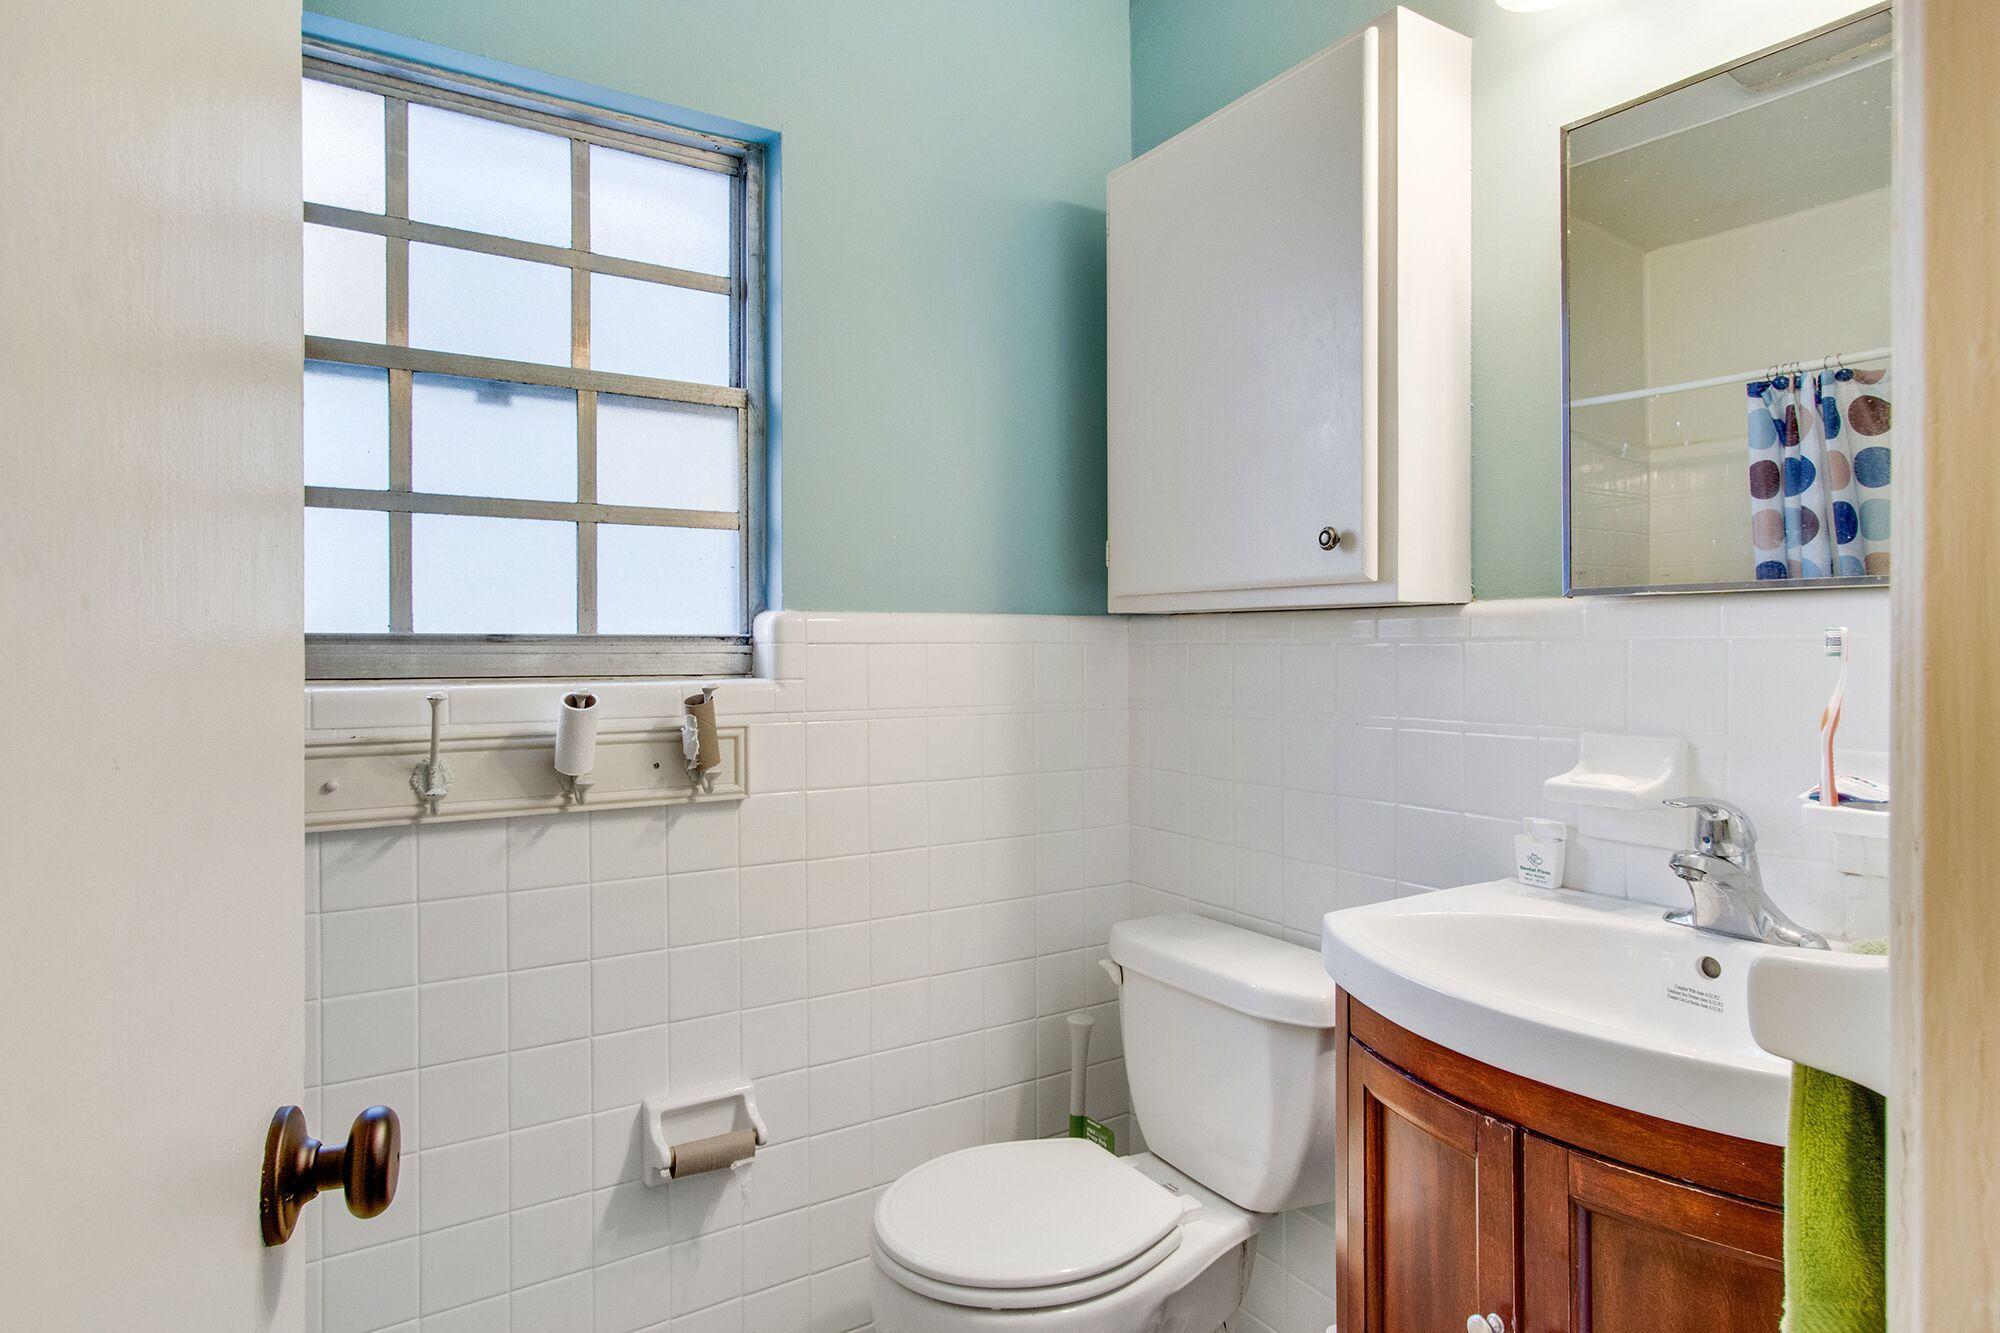 Rutledge Green Condos For Sale - 173 Rutledge, Charleston, SC - 5